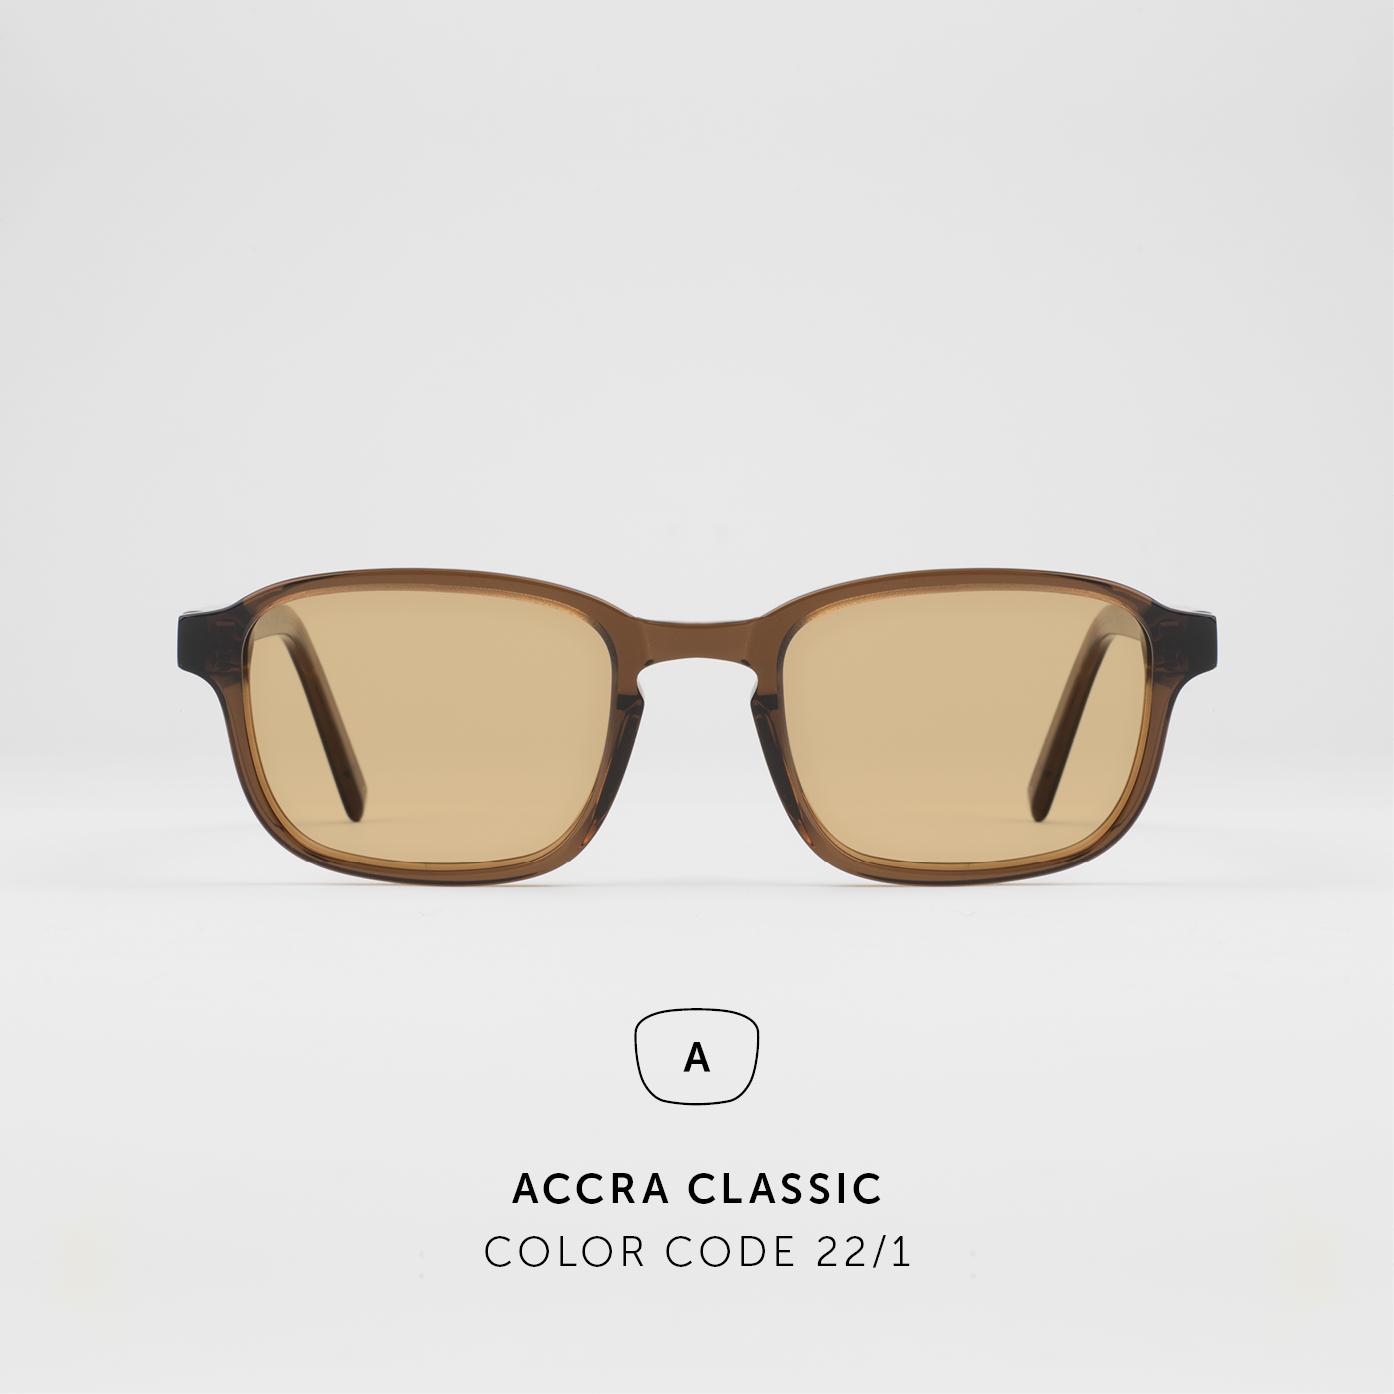 AccraClassic56.jpg